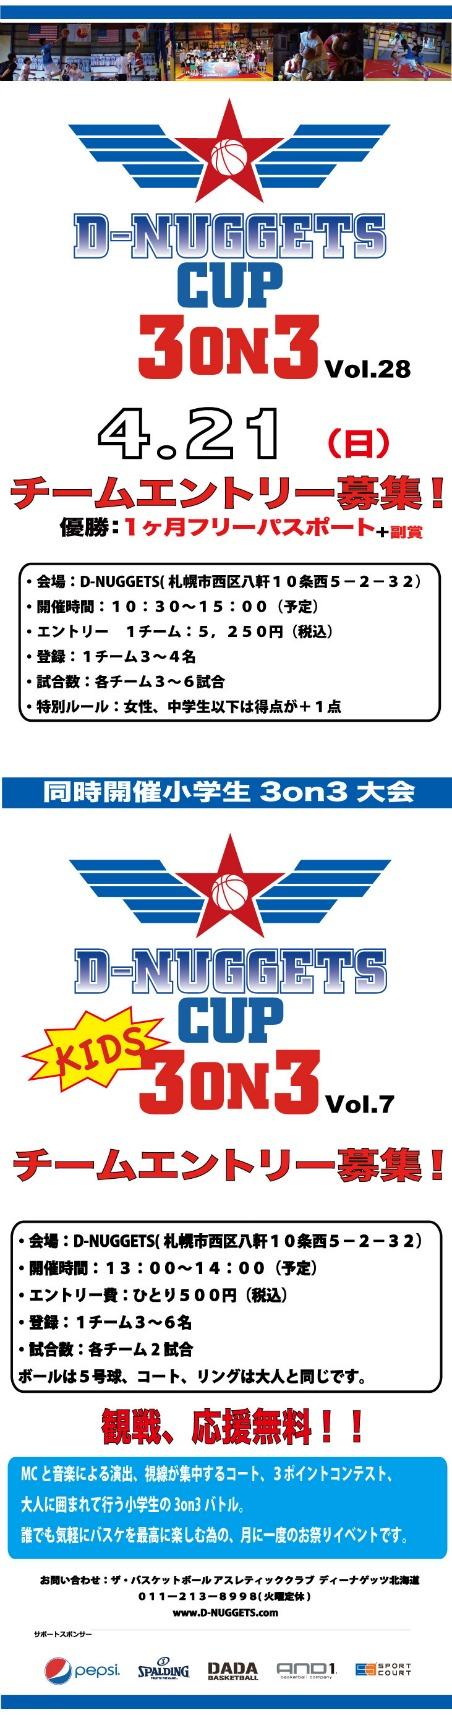 D-NUGGETS-CUP-HOKKAIDO-Vol.28.jpg